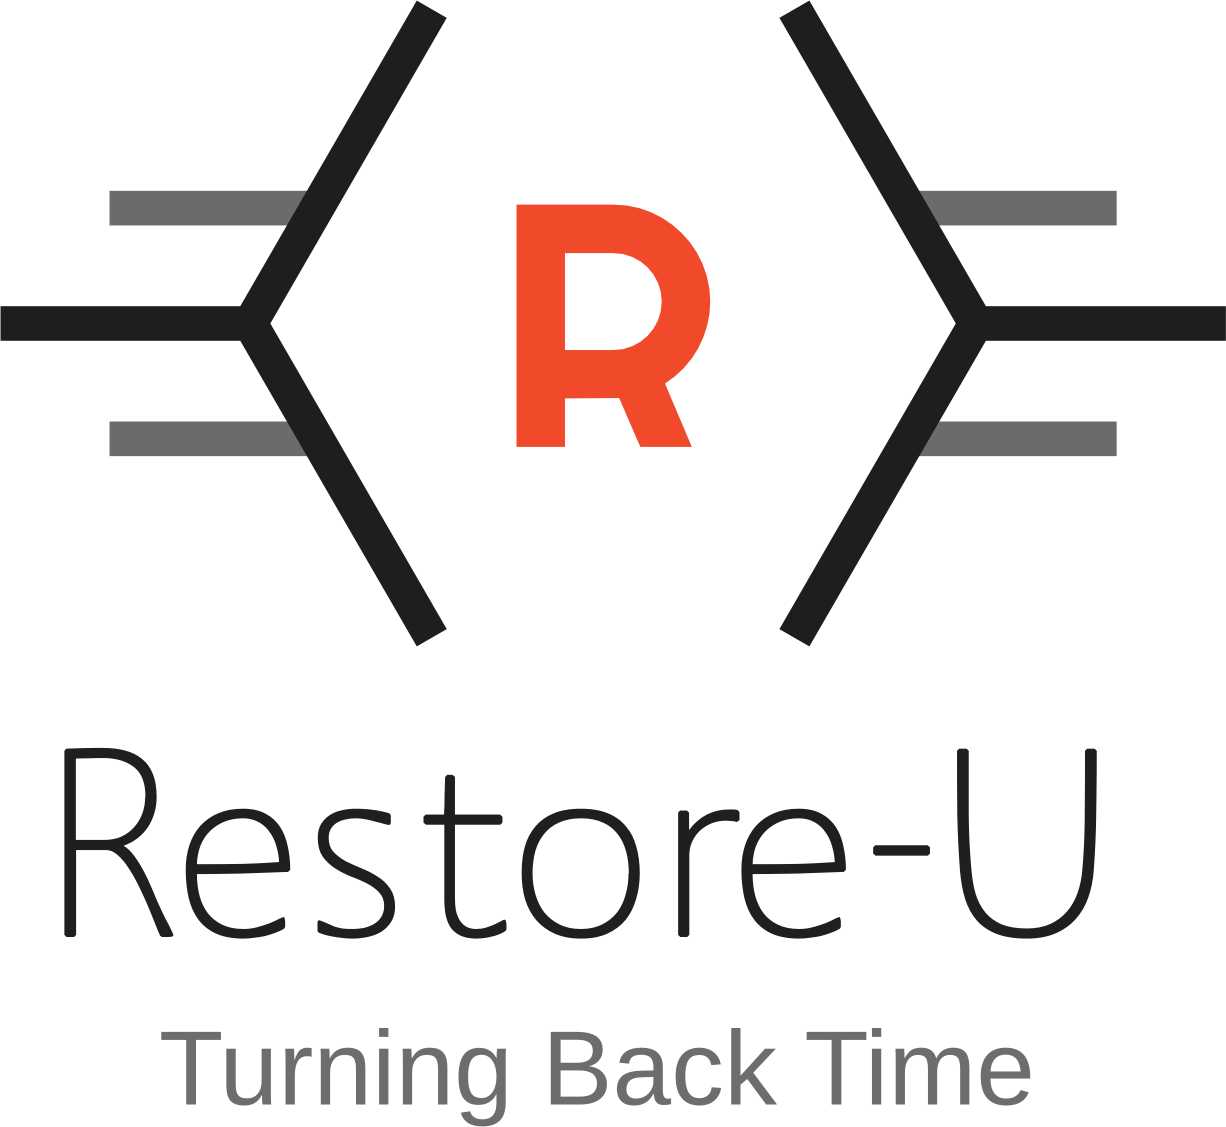 Restore-U NMN Logo